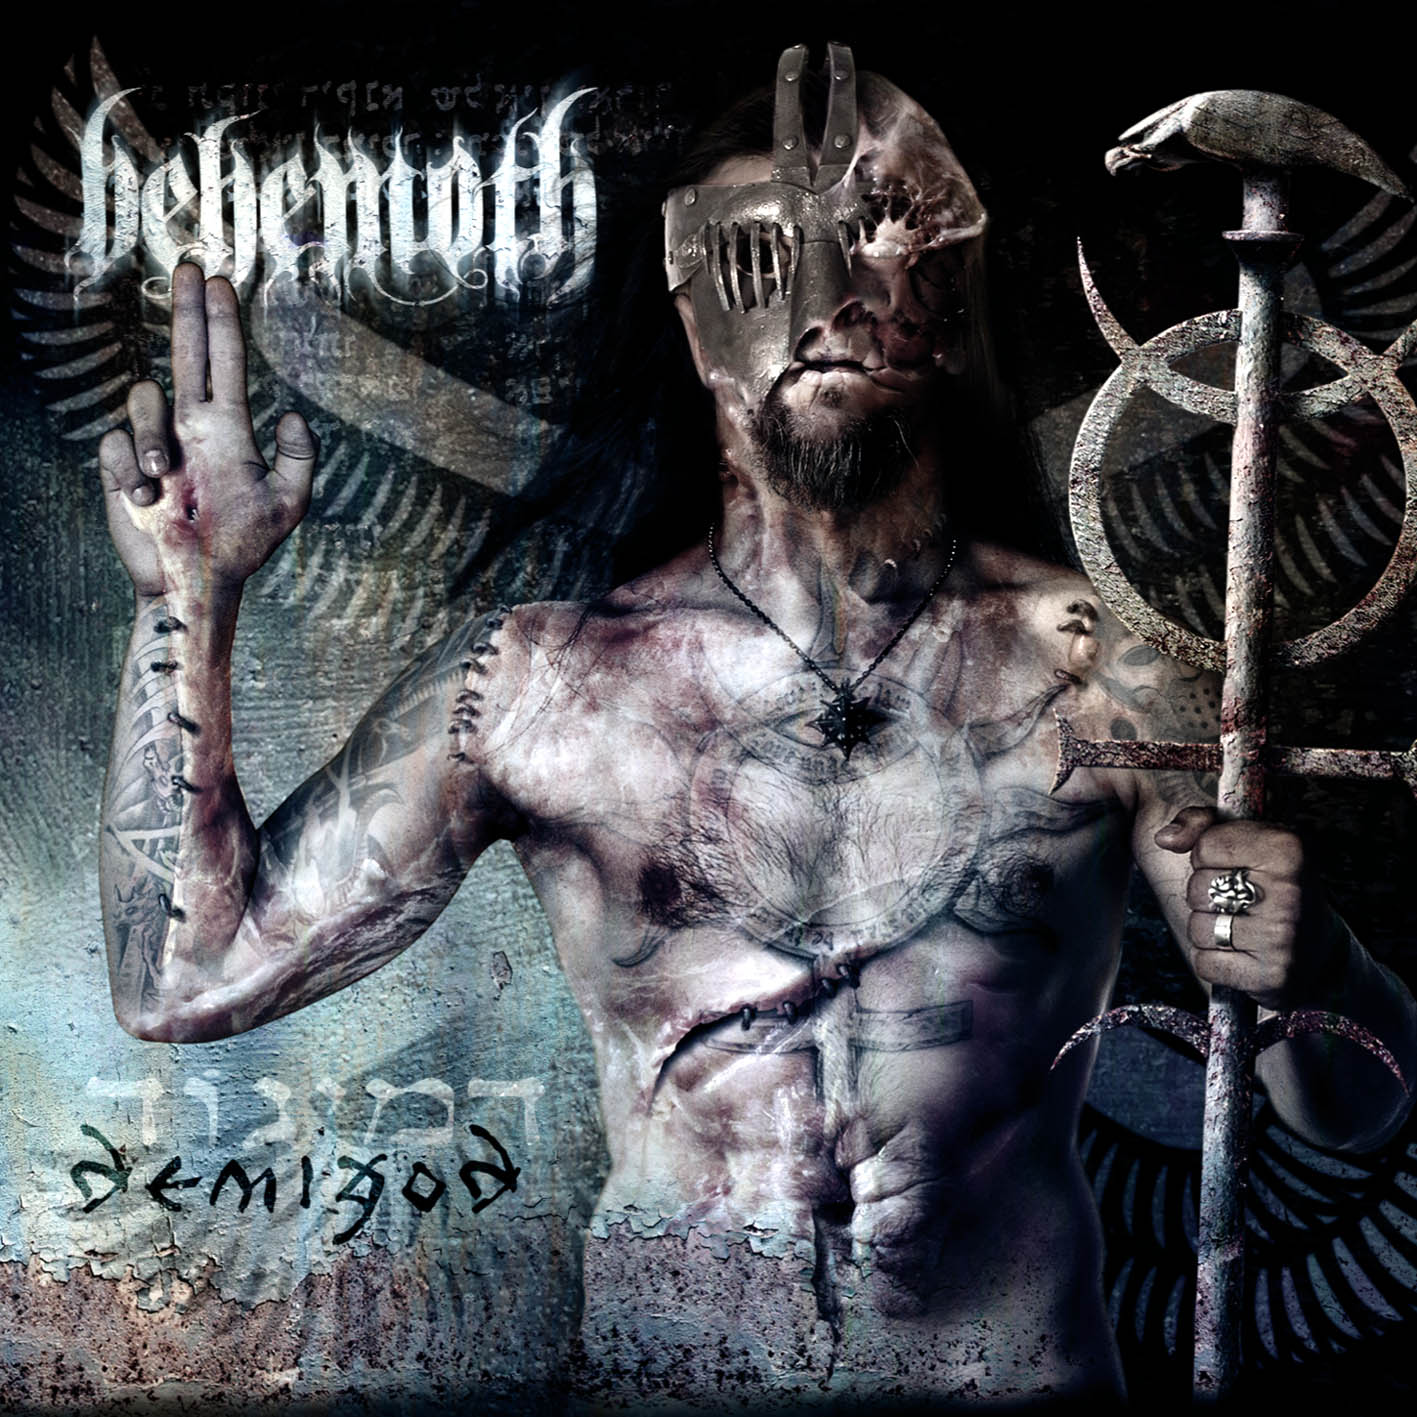 http://www.soundcult.com/wp-content/uploads/behemoth-demigod.jpg